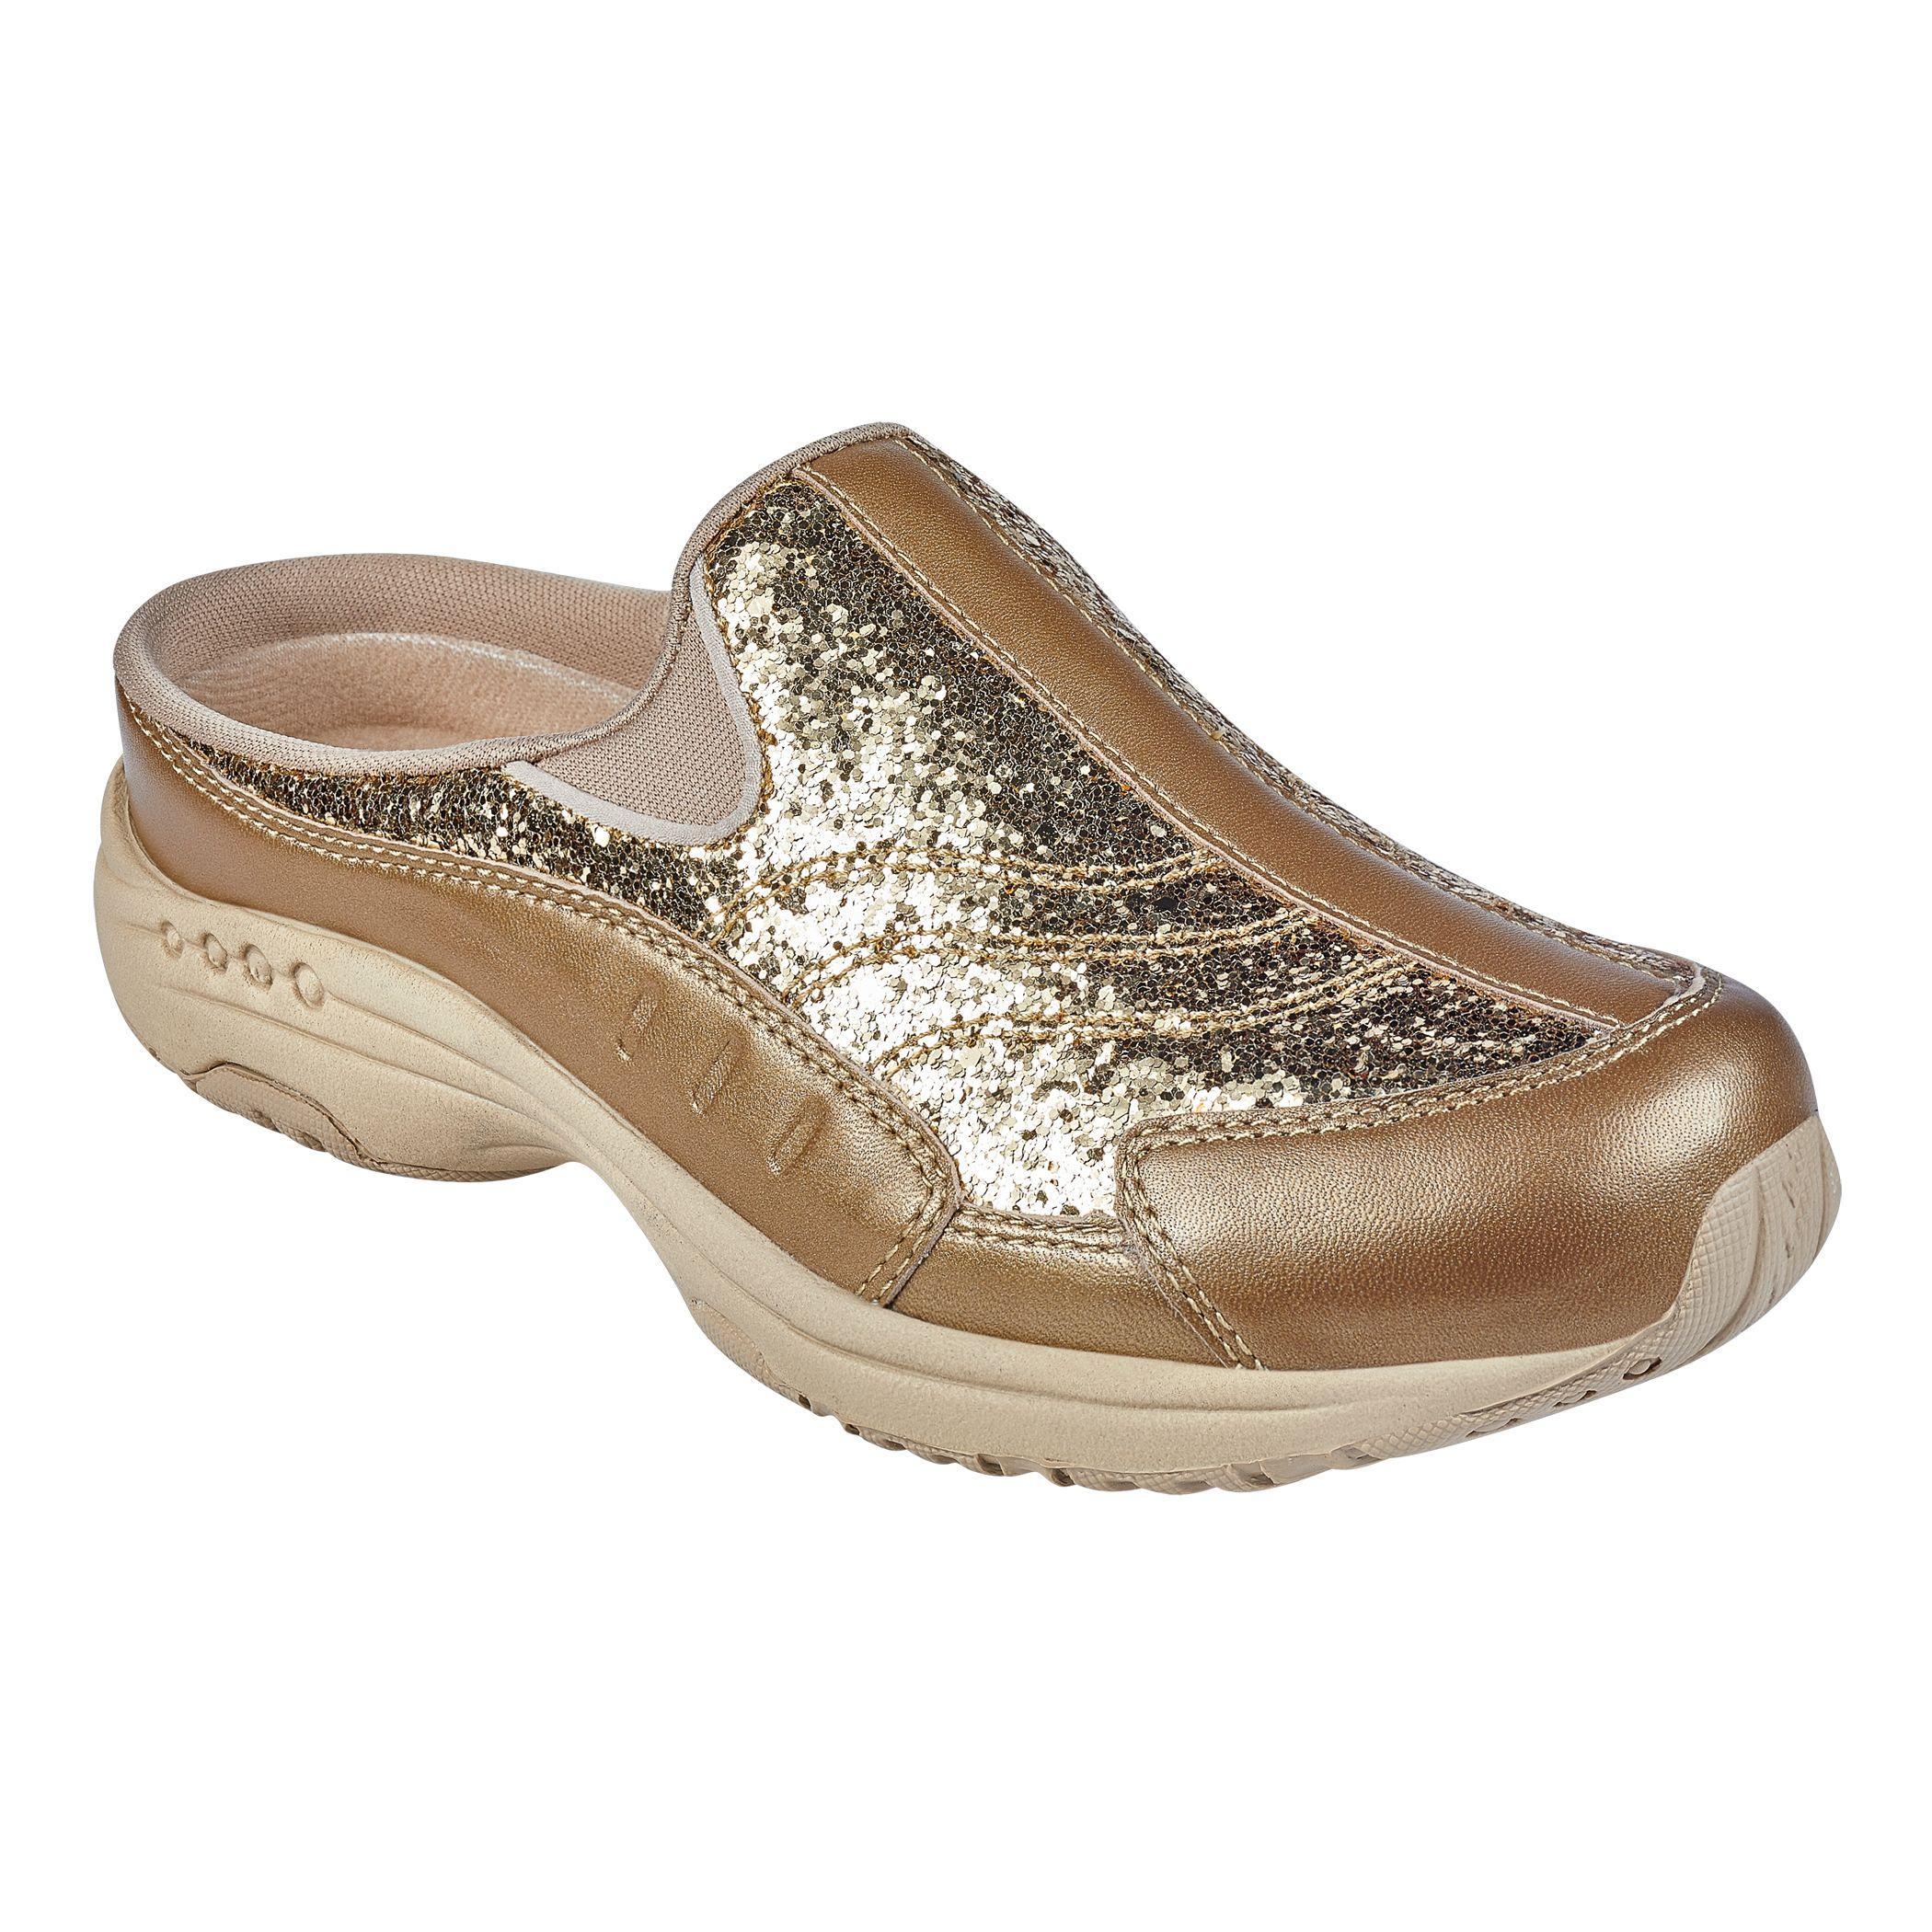 Leather Traveltime Glitter Clogs